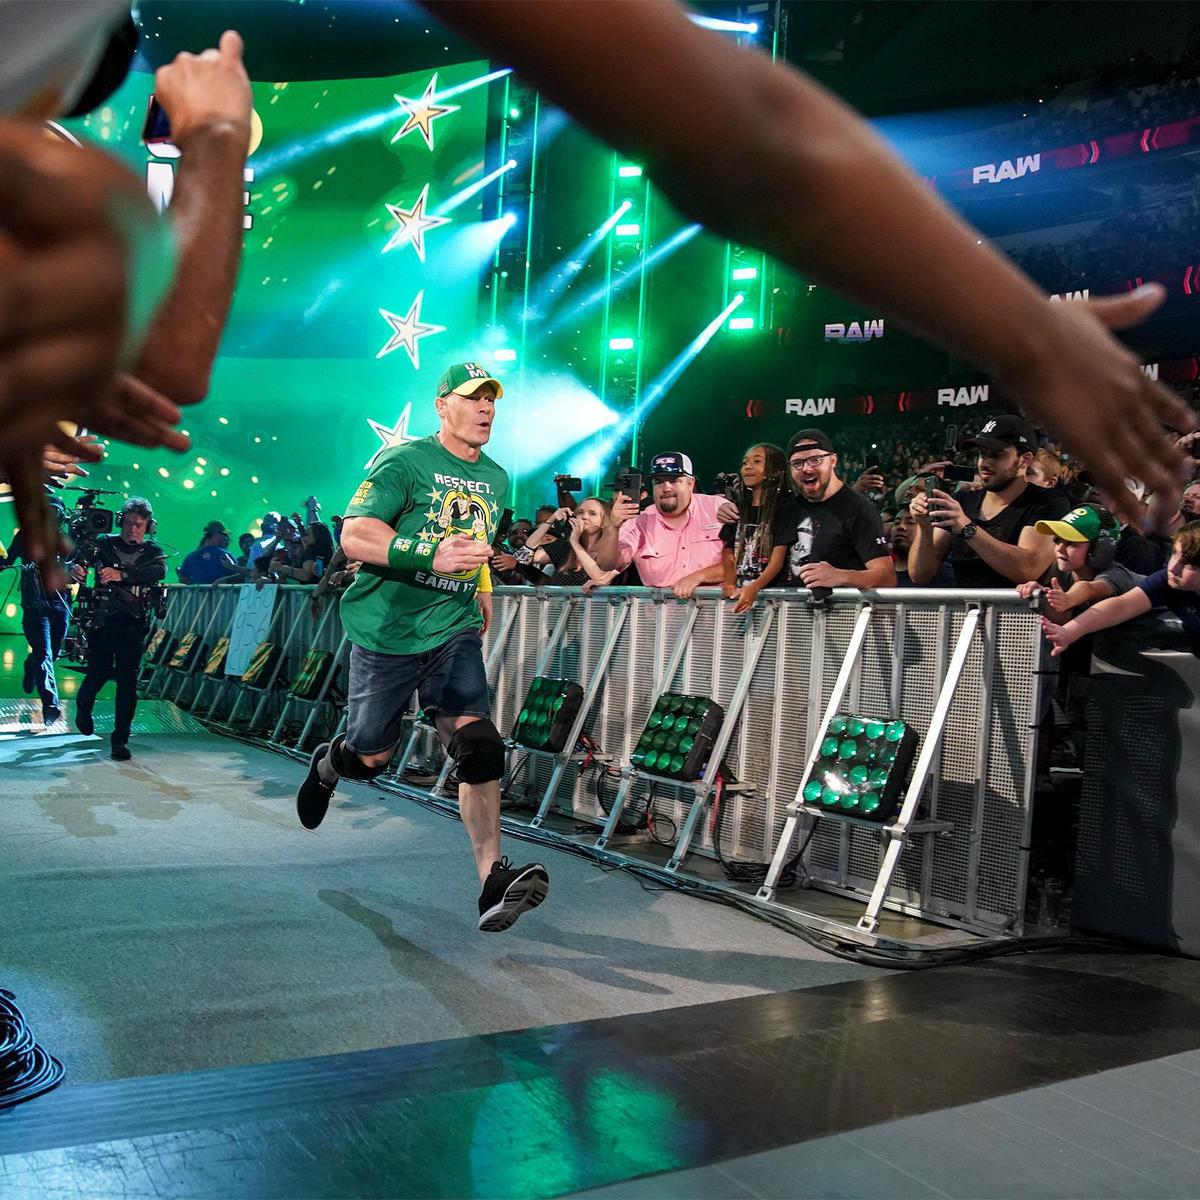 John Cena Announced For 15 WWE Shows Through This Summer 2